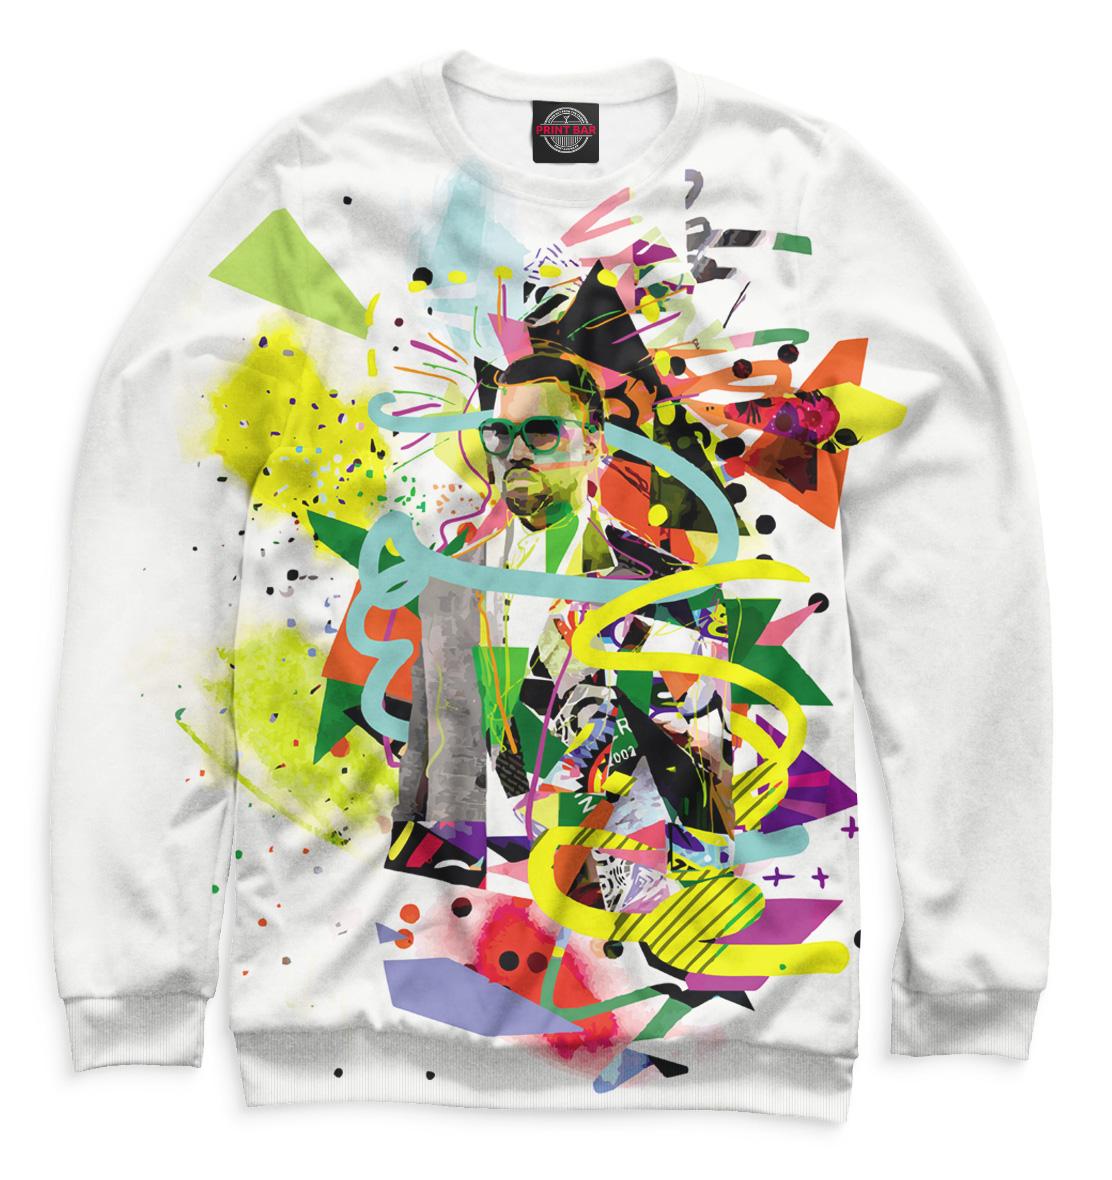 Купить Kanye West, Printbar, Свитшоты, KAW-569254-swi-2